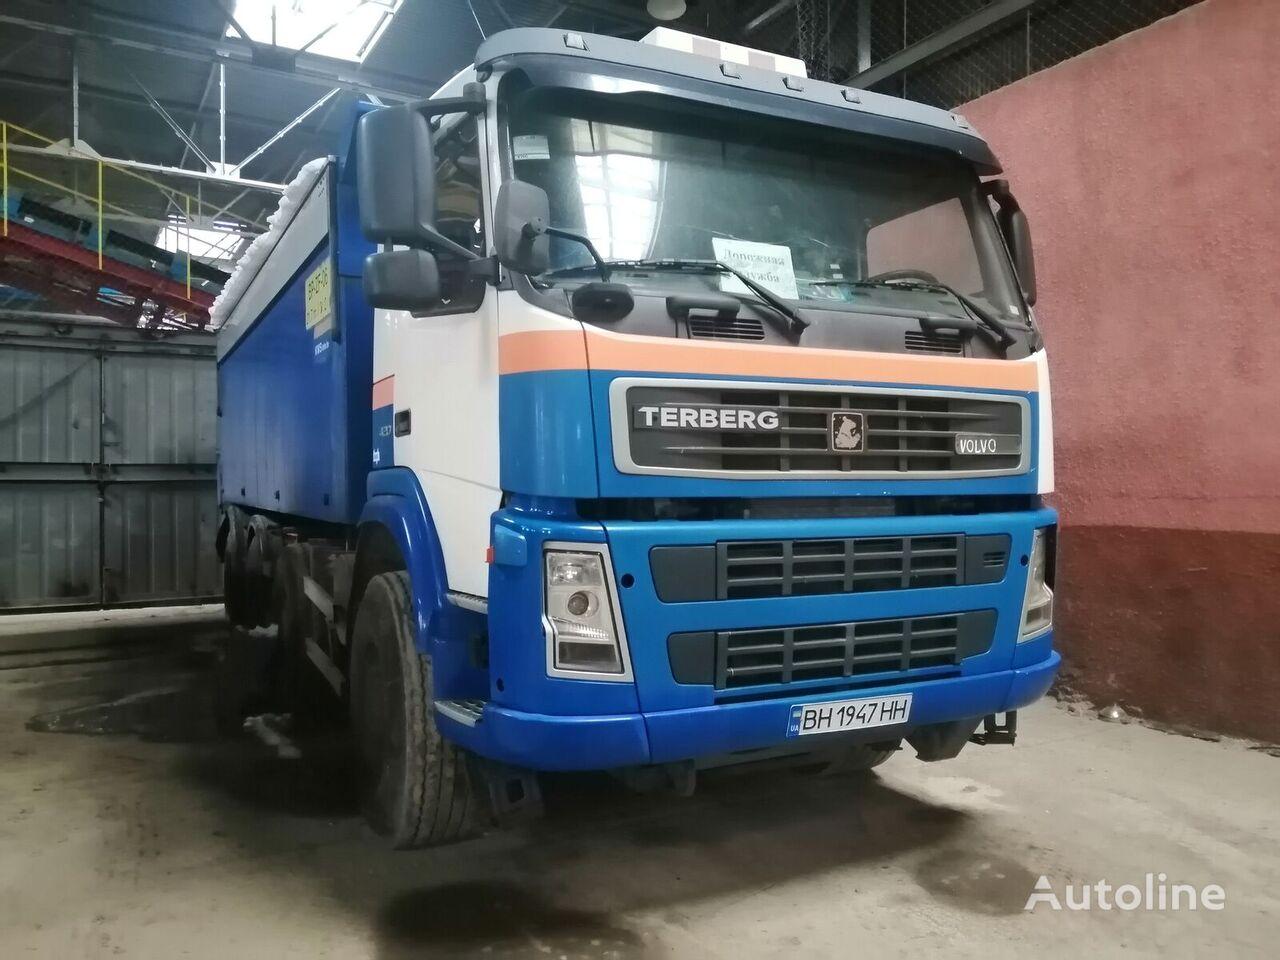 VOLVO Terberg dump truck